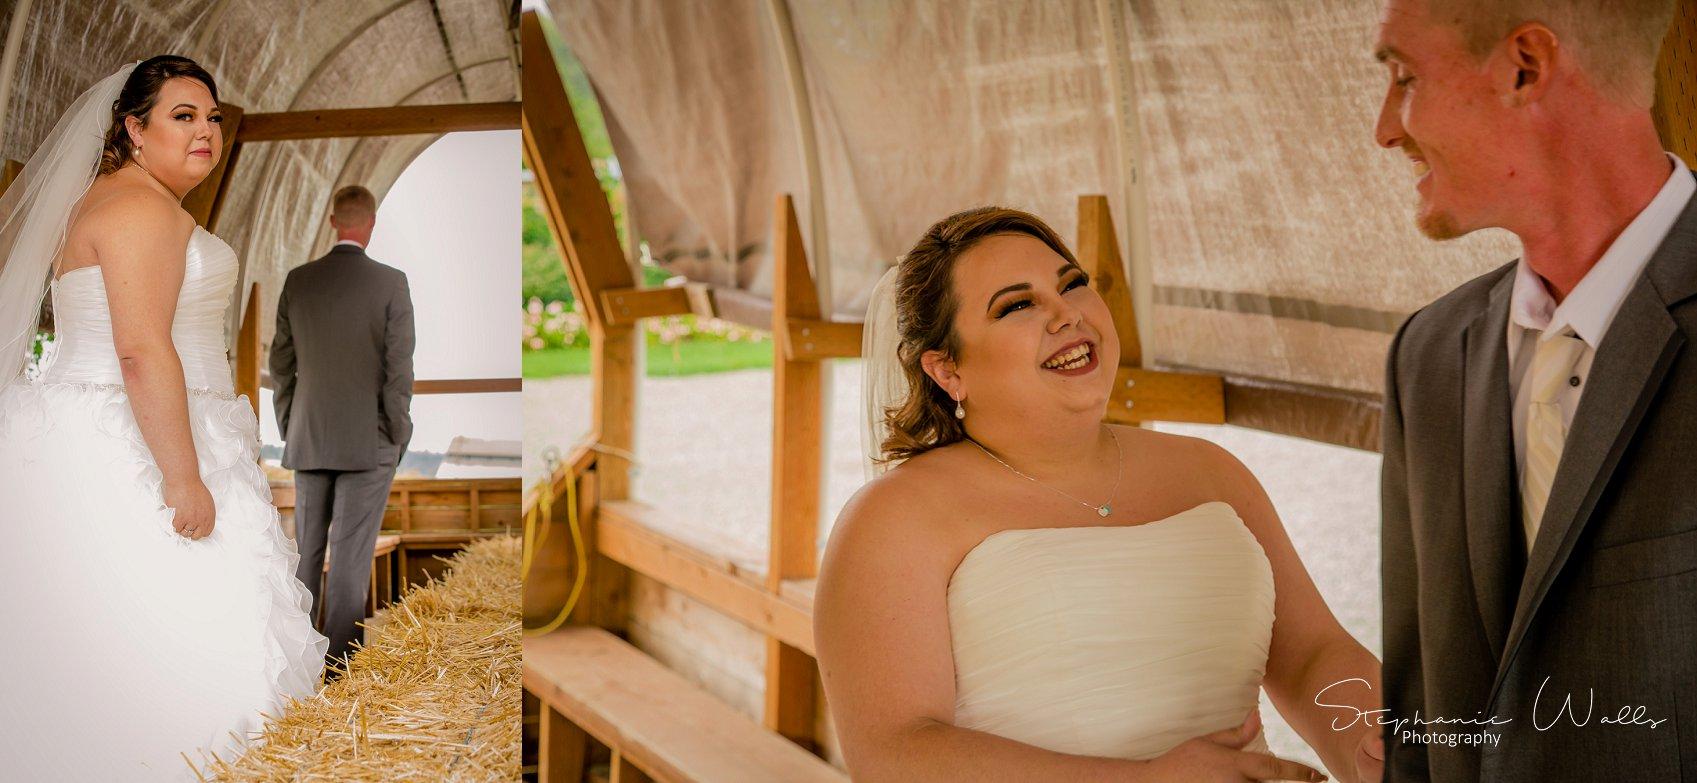 Kimble Wedding 006 Marlena & Allans | Snohomish Red Barn Events (Stocker Farms) | Snohomish, Wa Wedding Photographer